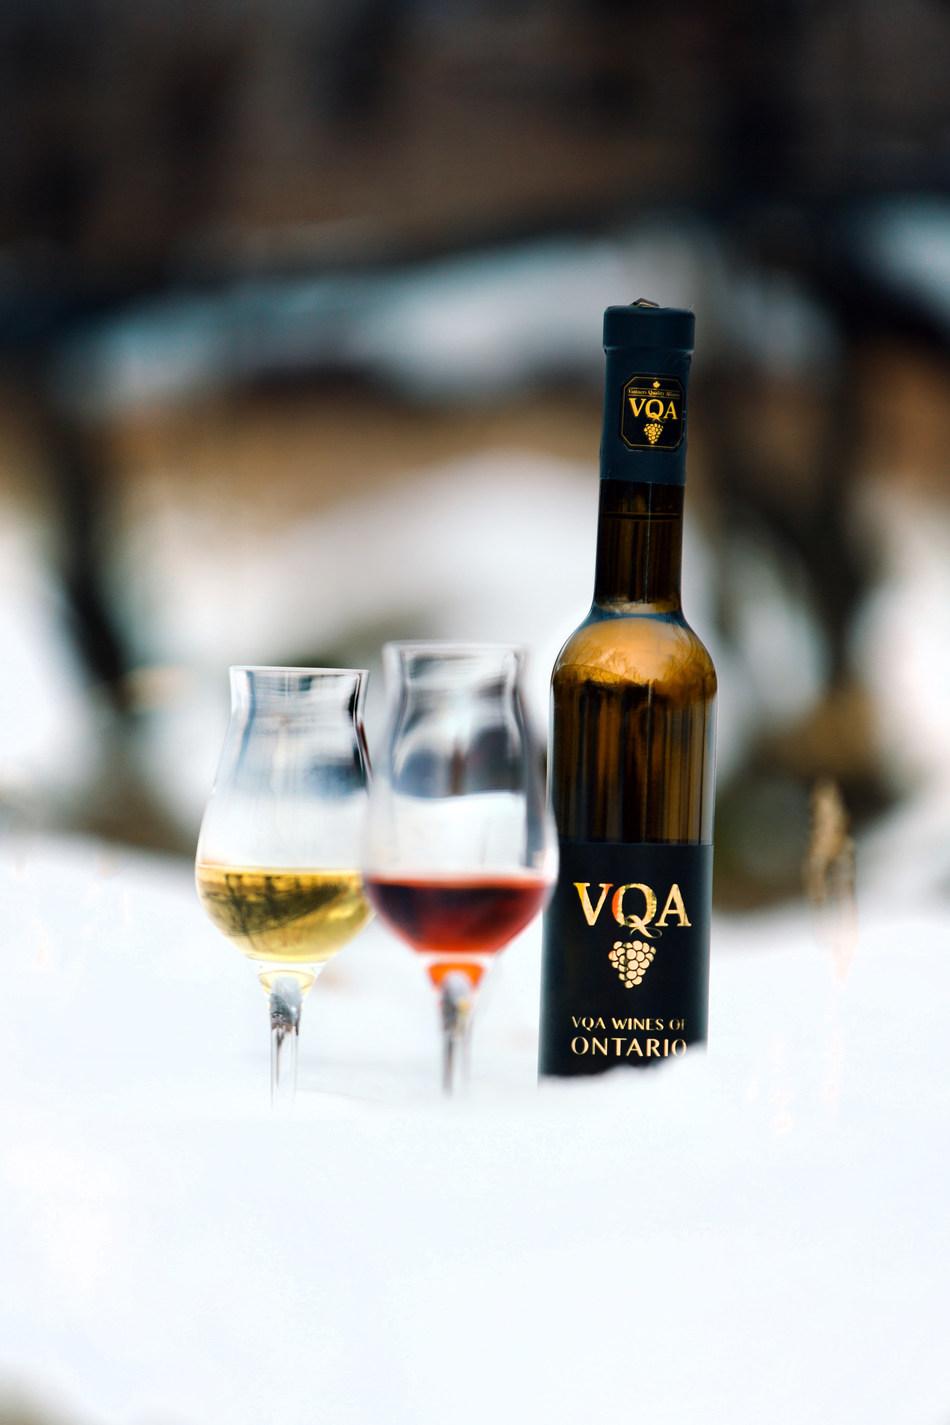 VQA Wines of Ontario Icewine in the Vineyard (CNW Group/Wine Marketing Association of Ontario)